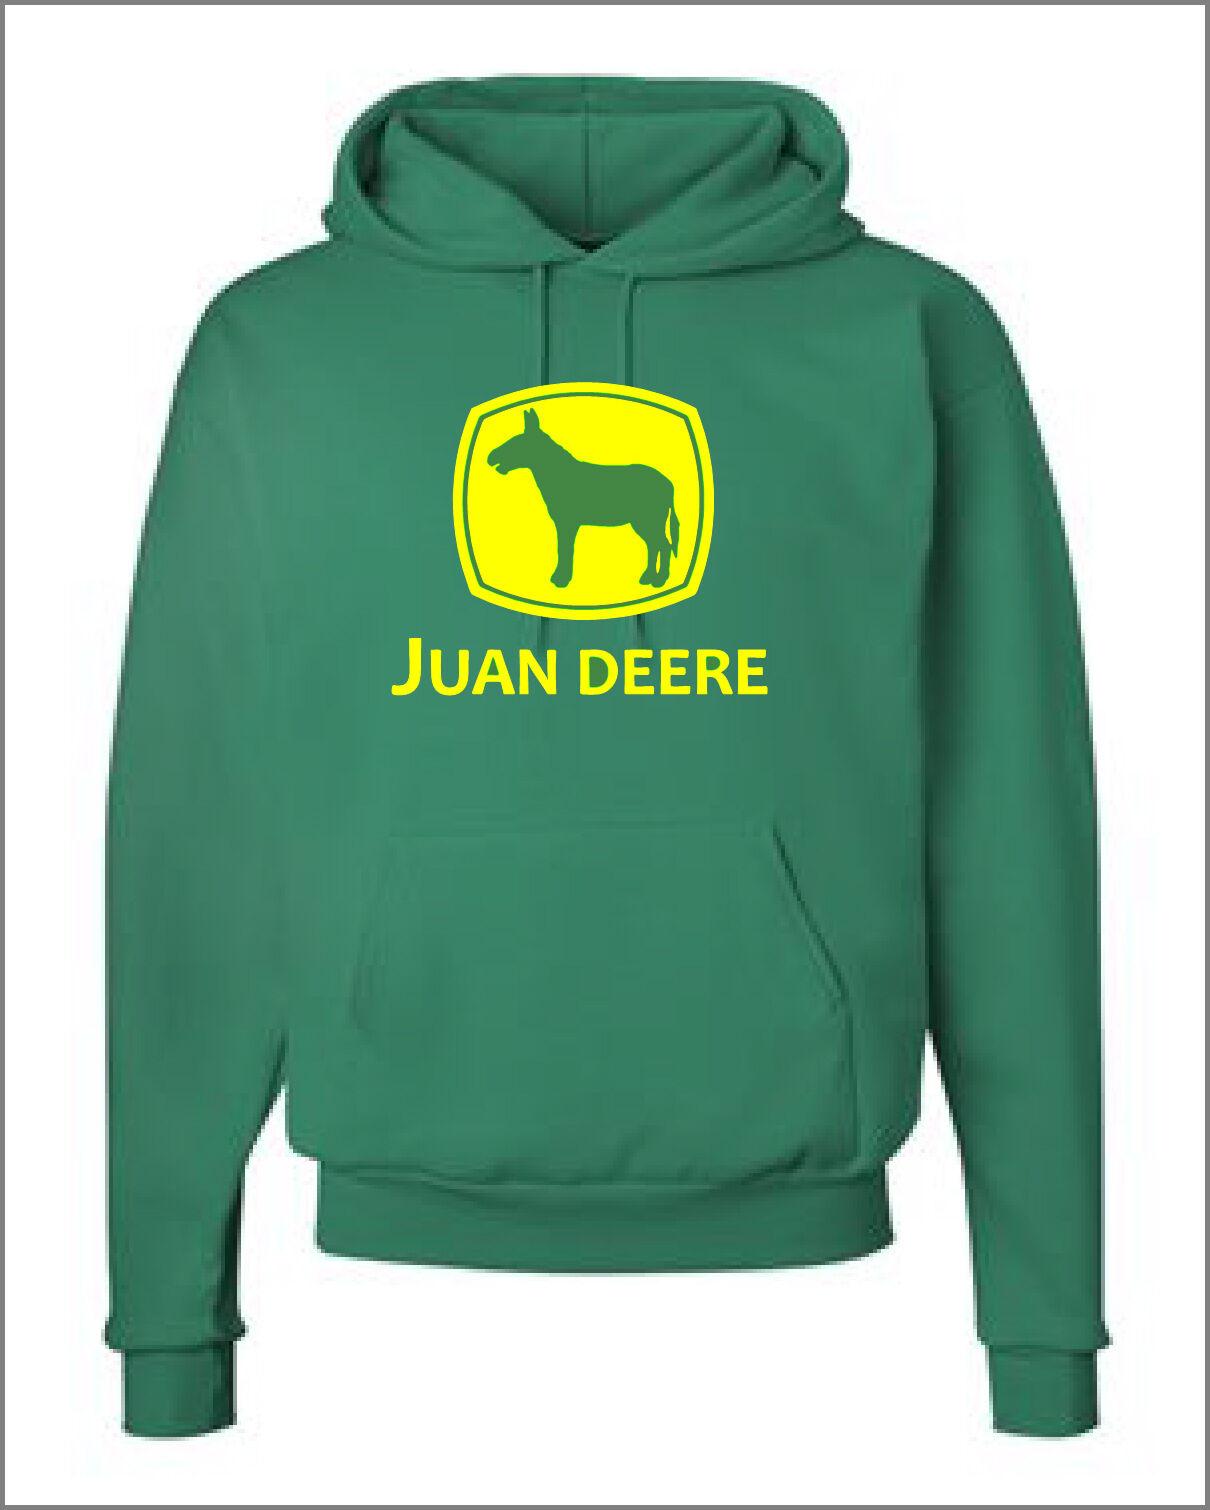 Juan Deere Funny Hoodie schweißhemd John landscaping landscaper tractor lawnmower